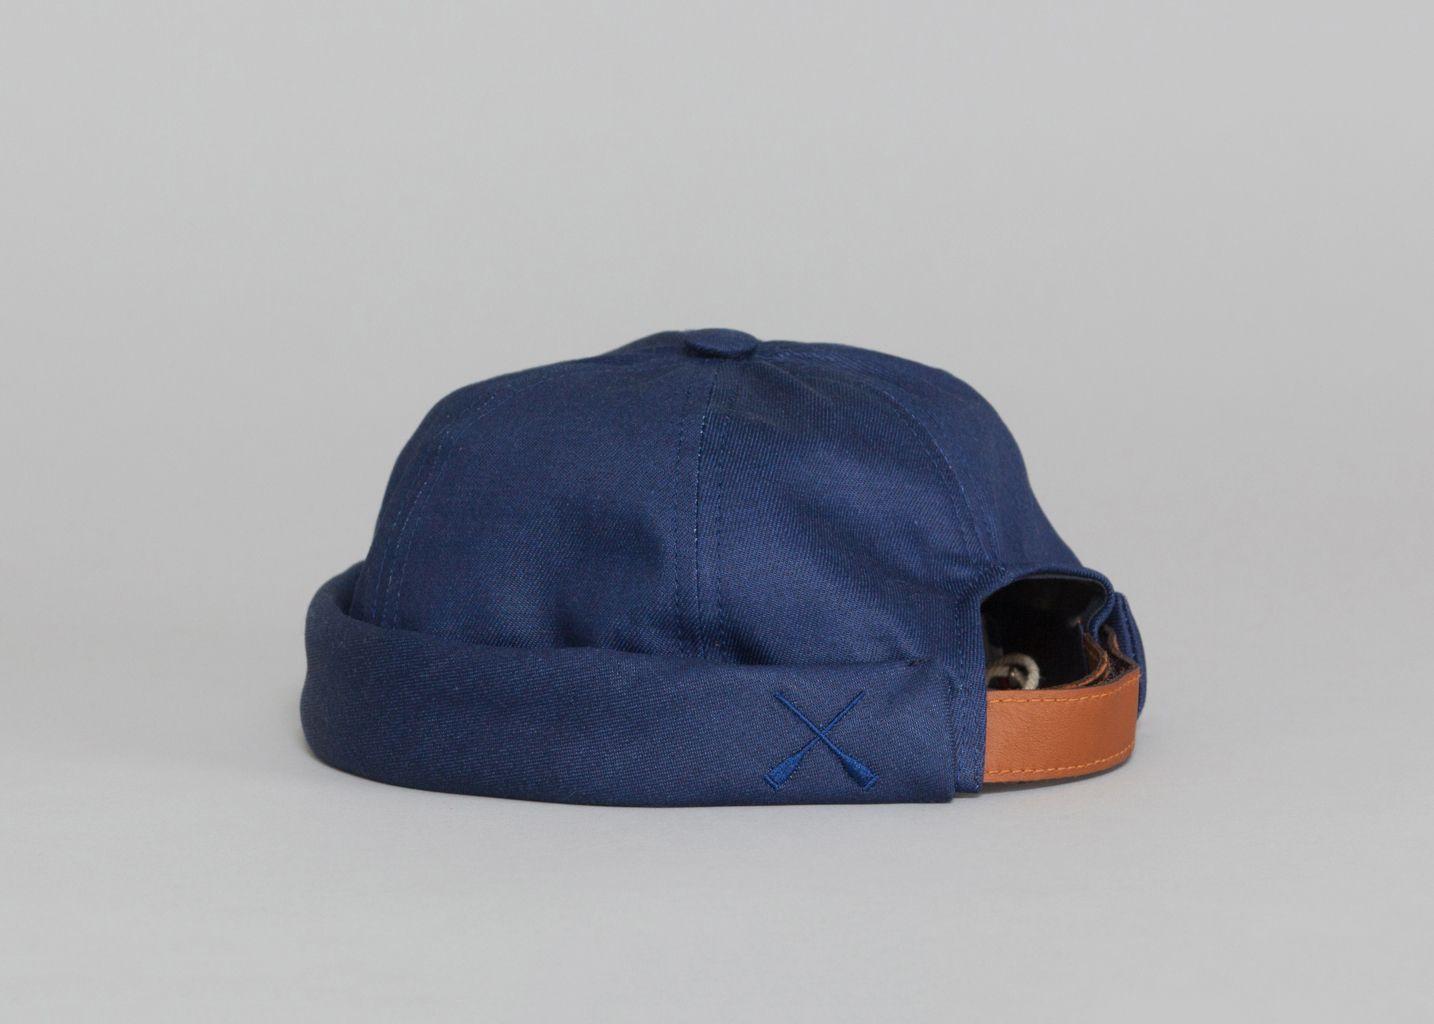 adbb2e03fd2 Plain Miki Navy Blue Béton Ciré